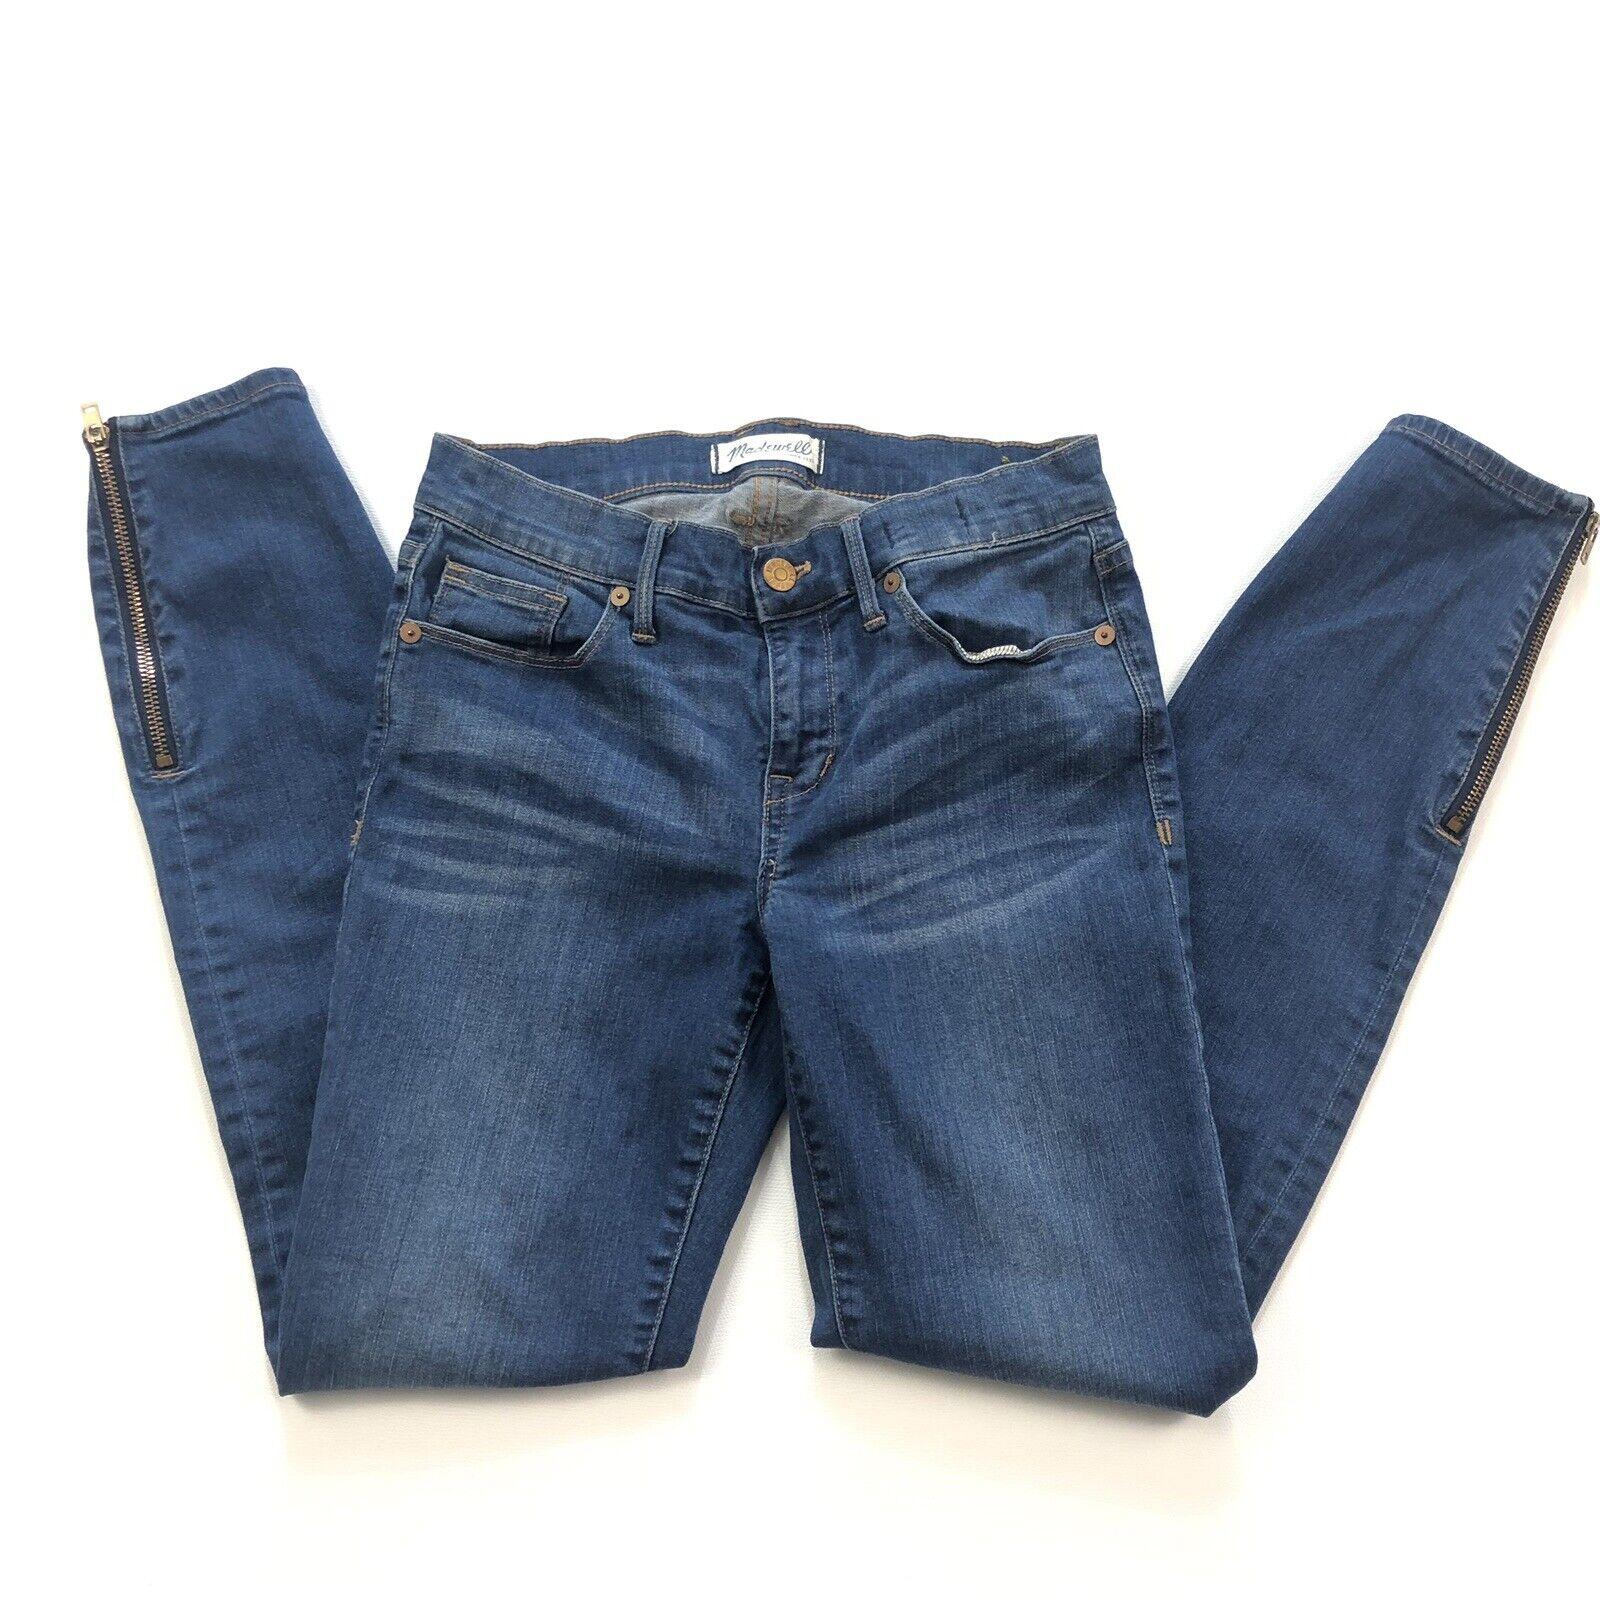 Madewell Skinny Skinny Ankle Side Zip Jeans medium dark wash sz 26